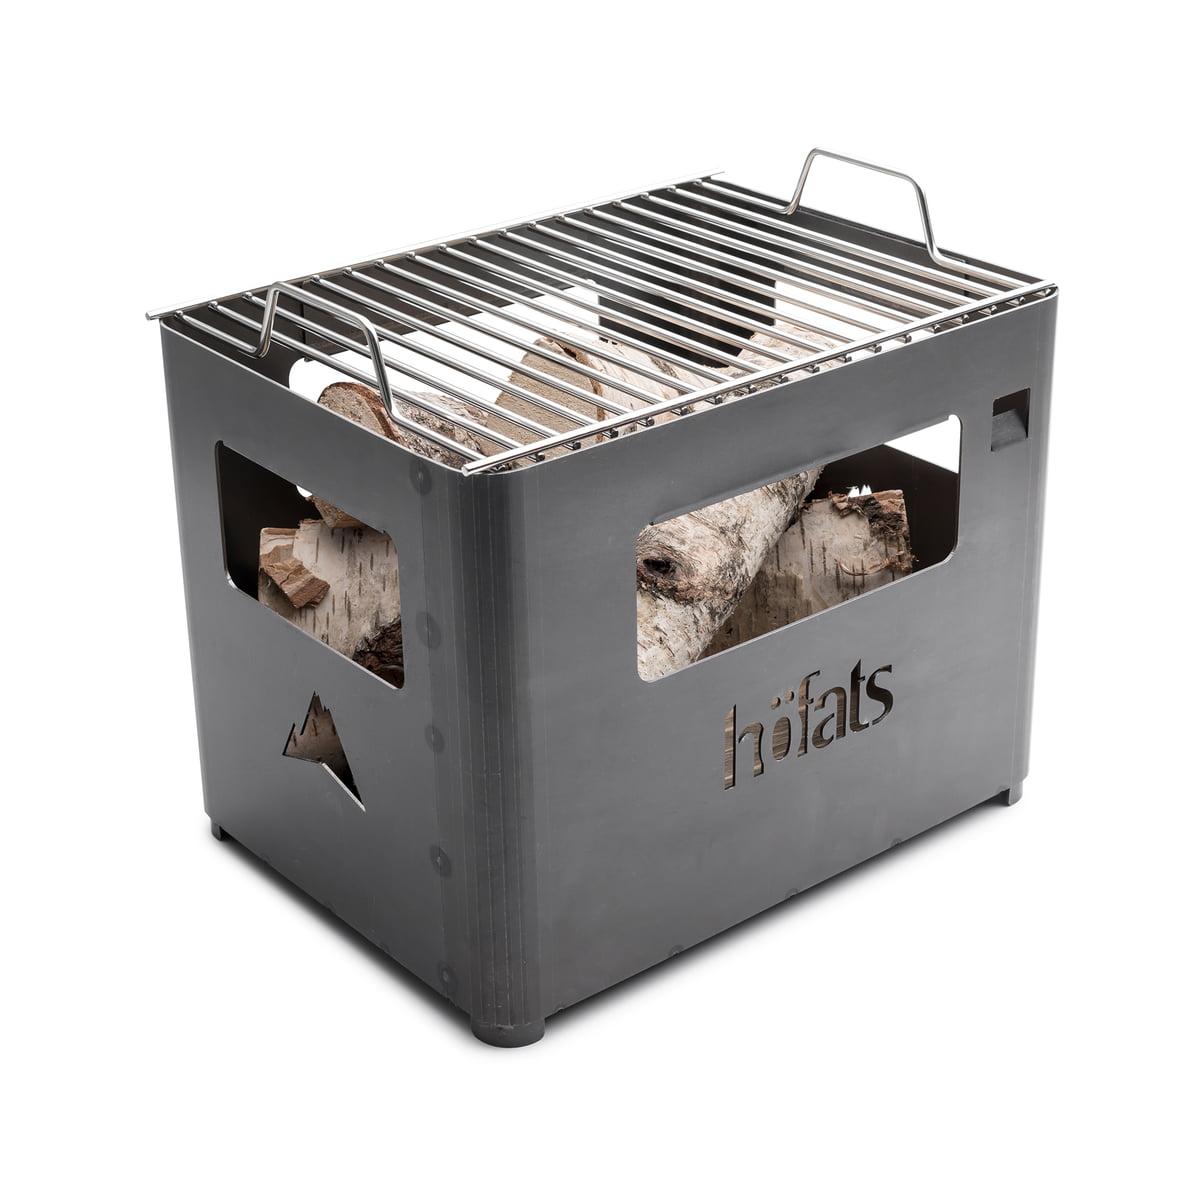 grillrost f r beer box feuerkorb von h fats connox. Black Bedroom Furniture Sets. Home Design Ideas